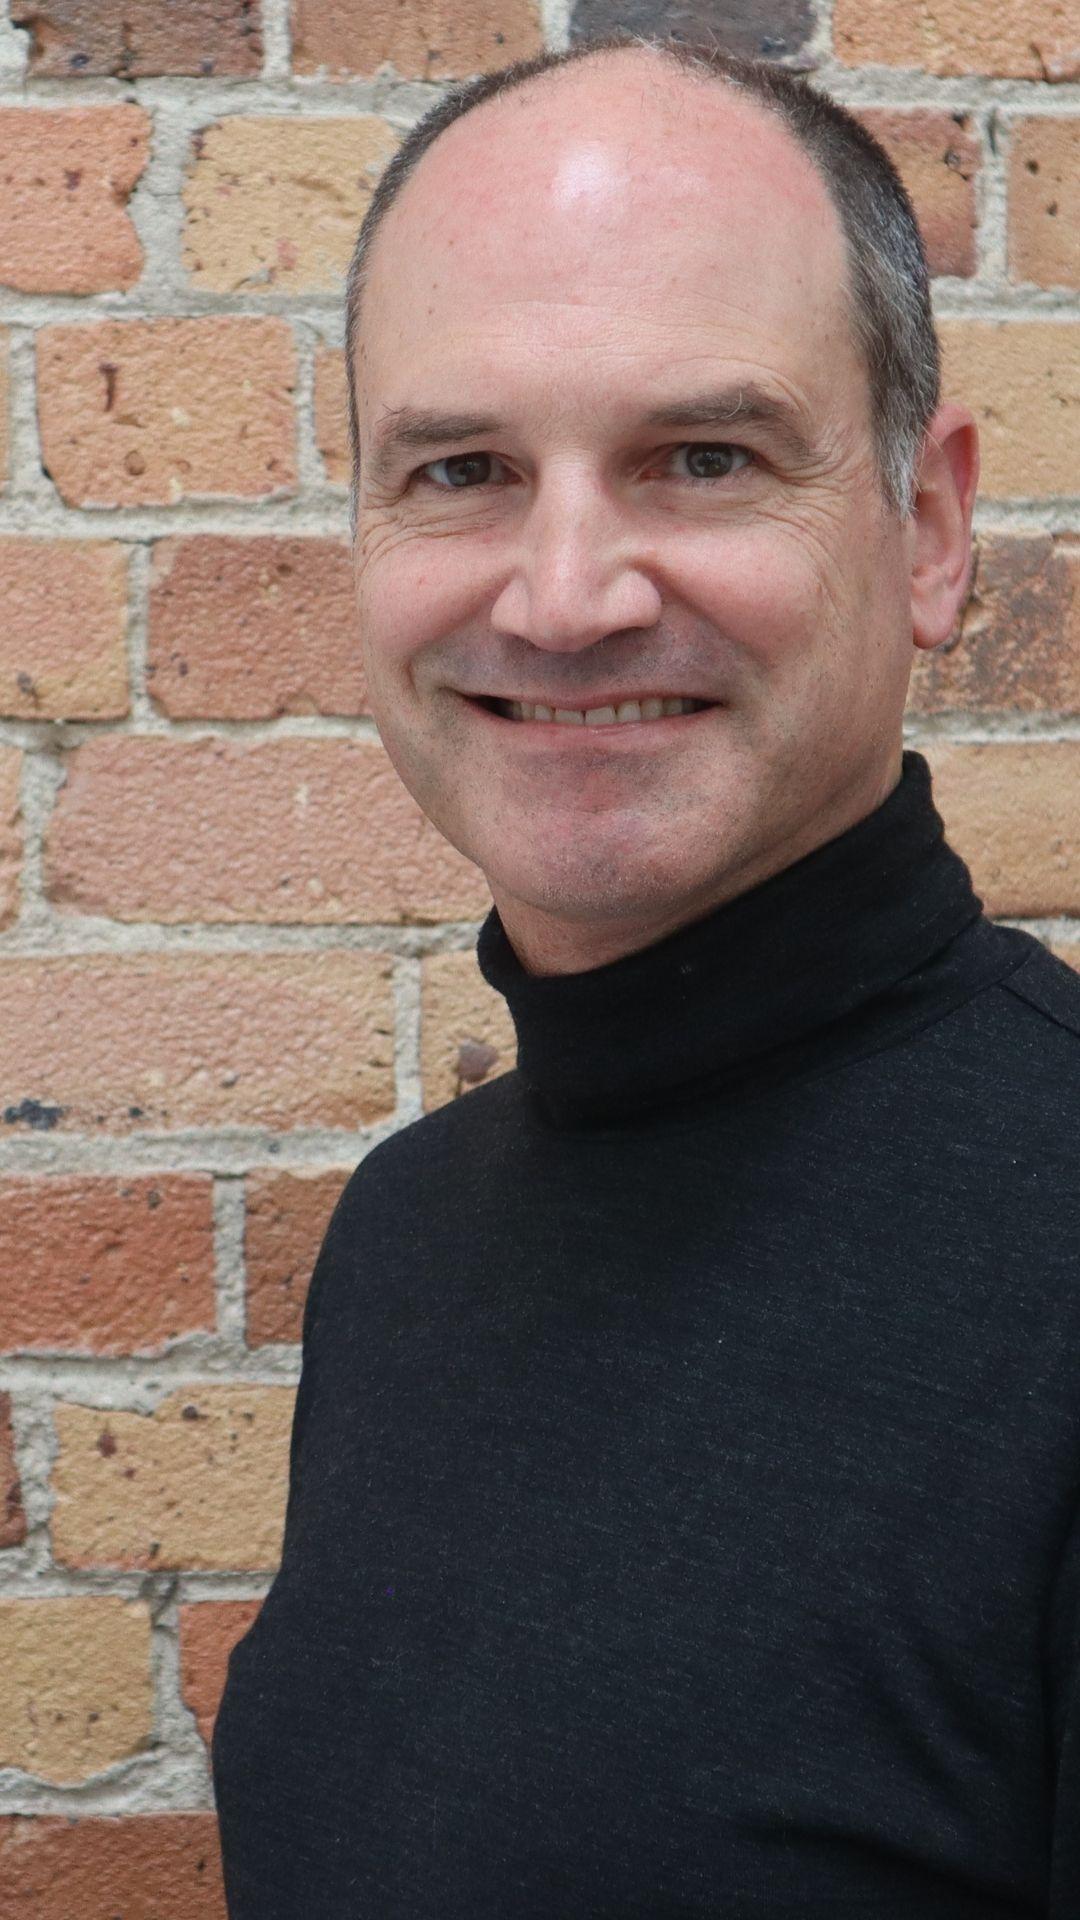 Gavin Lennox_Brick_Portrait_720_1280_Small